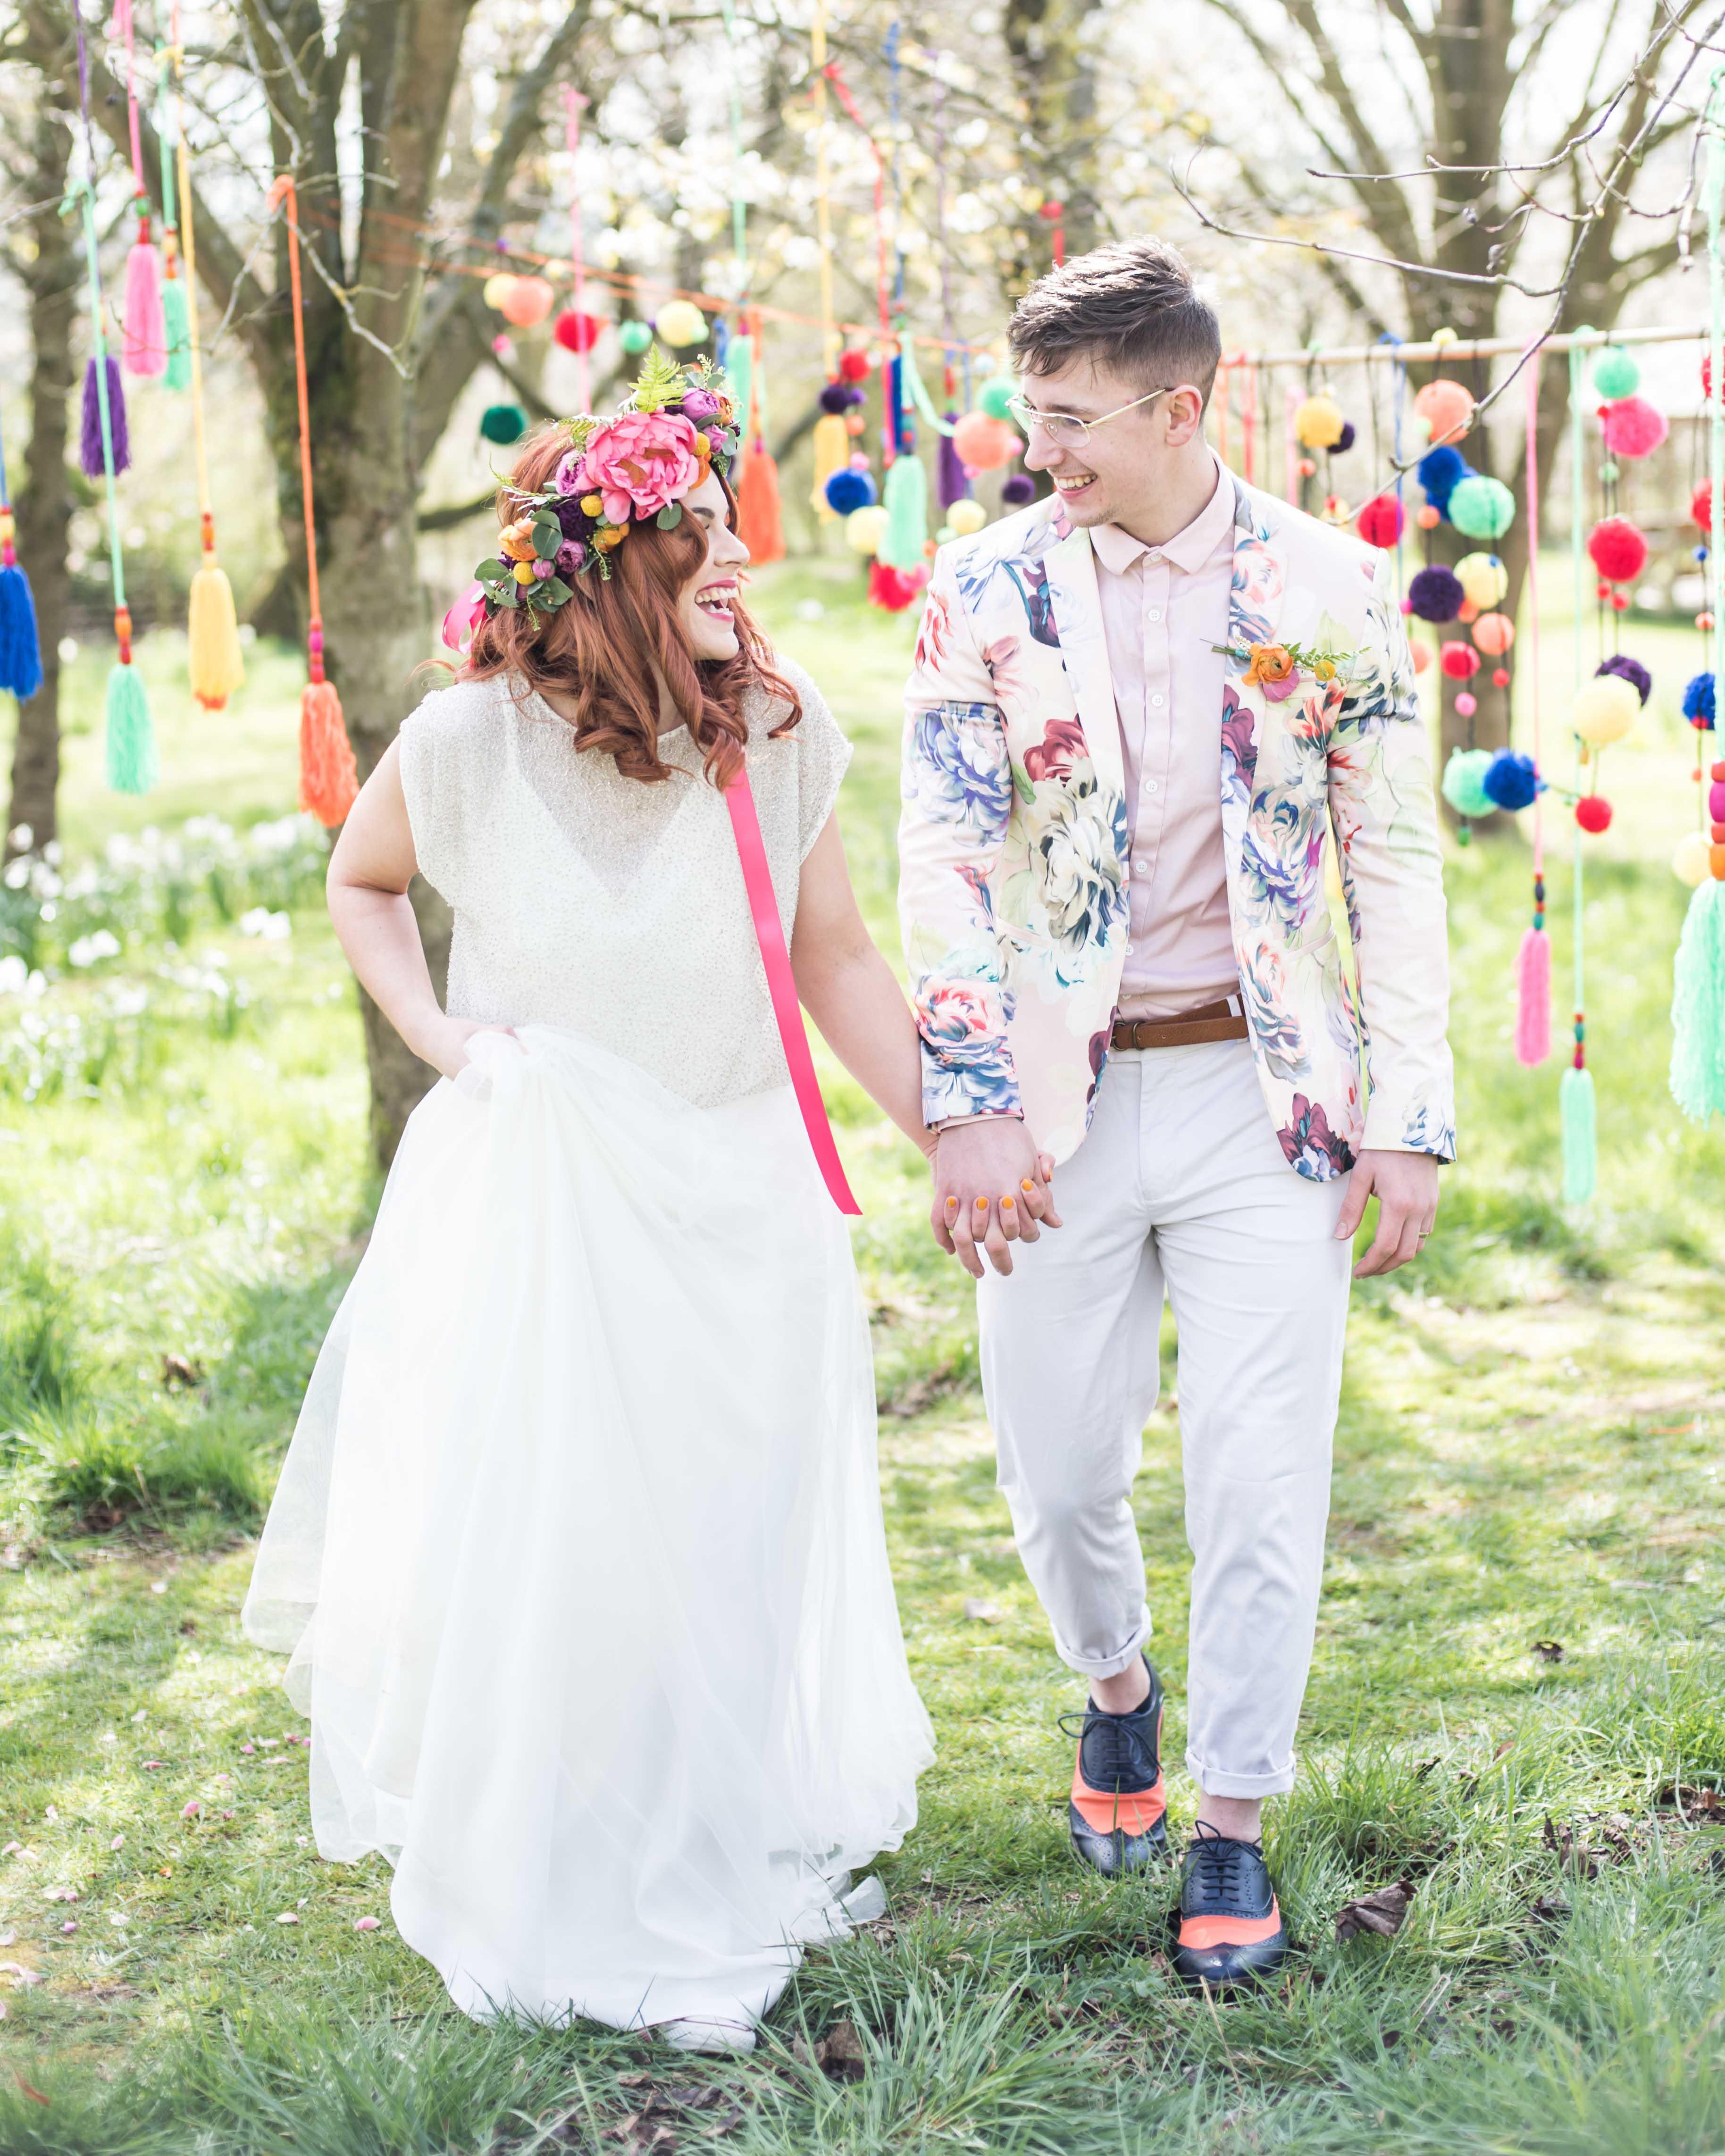 Matt Glover Photography- Quirky Rainbow Wedding- Unconventional Wedding- Alternative Wedding- Unique Wedding- Creative Wedding- Colourful Wedding- Unique Wedding Ideas- Unique Wedding Dress- Unique Groomswear